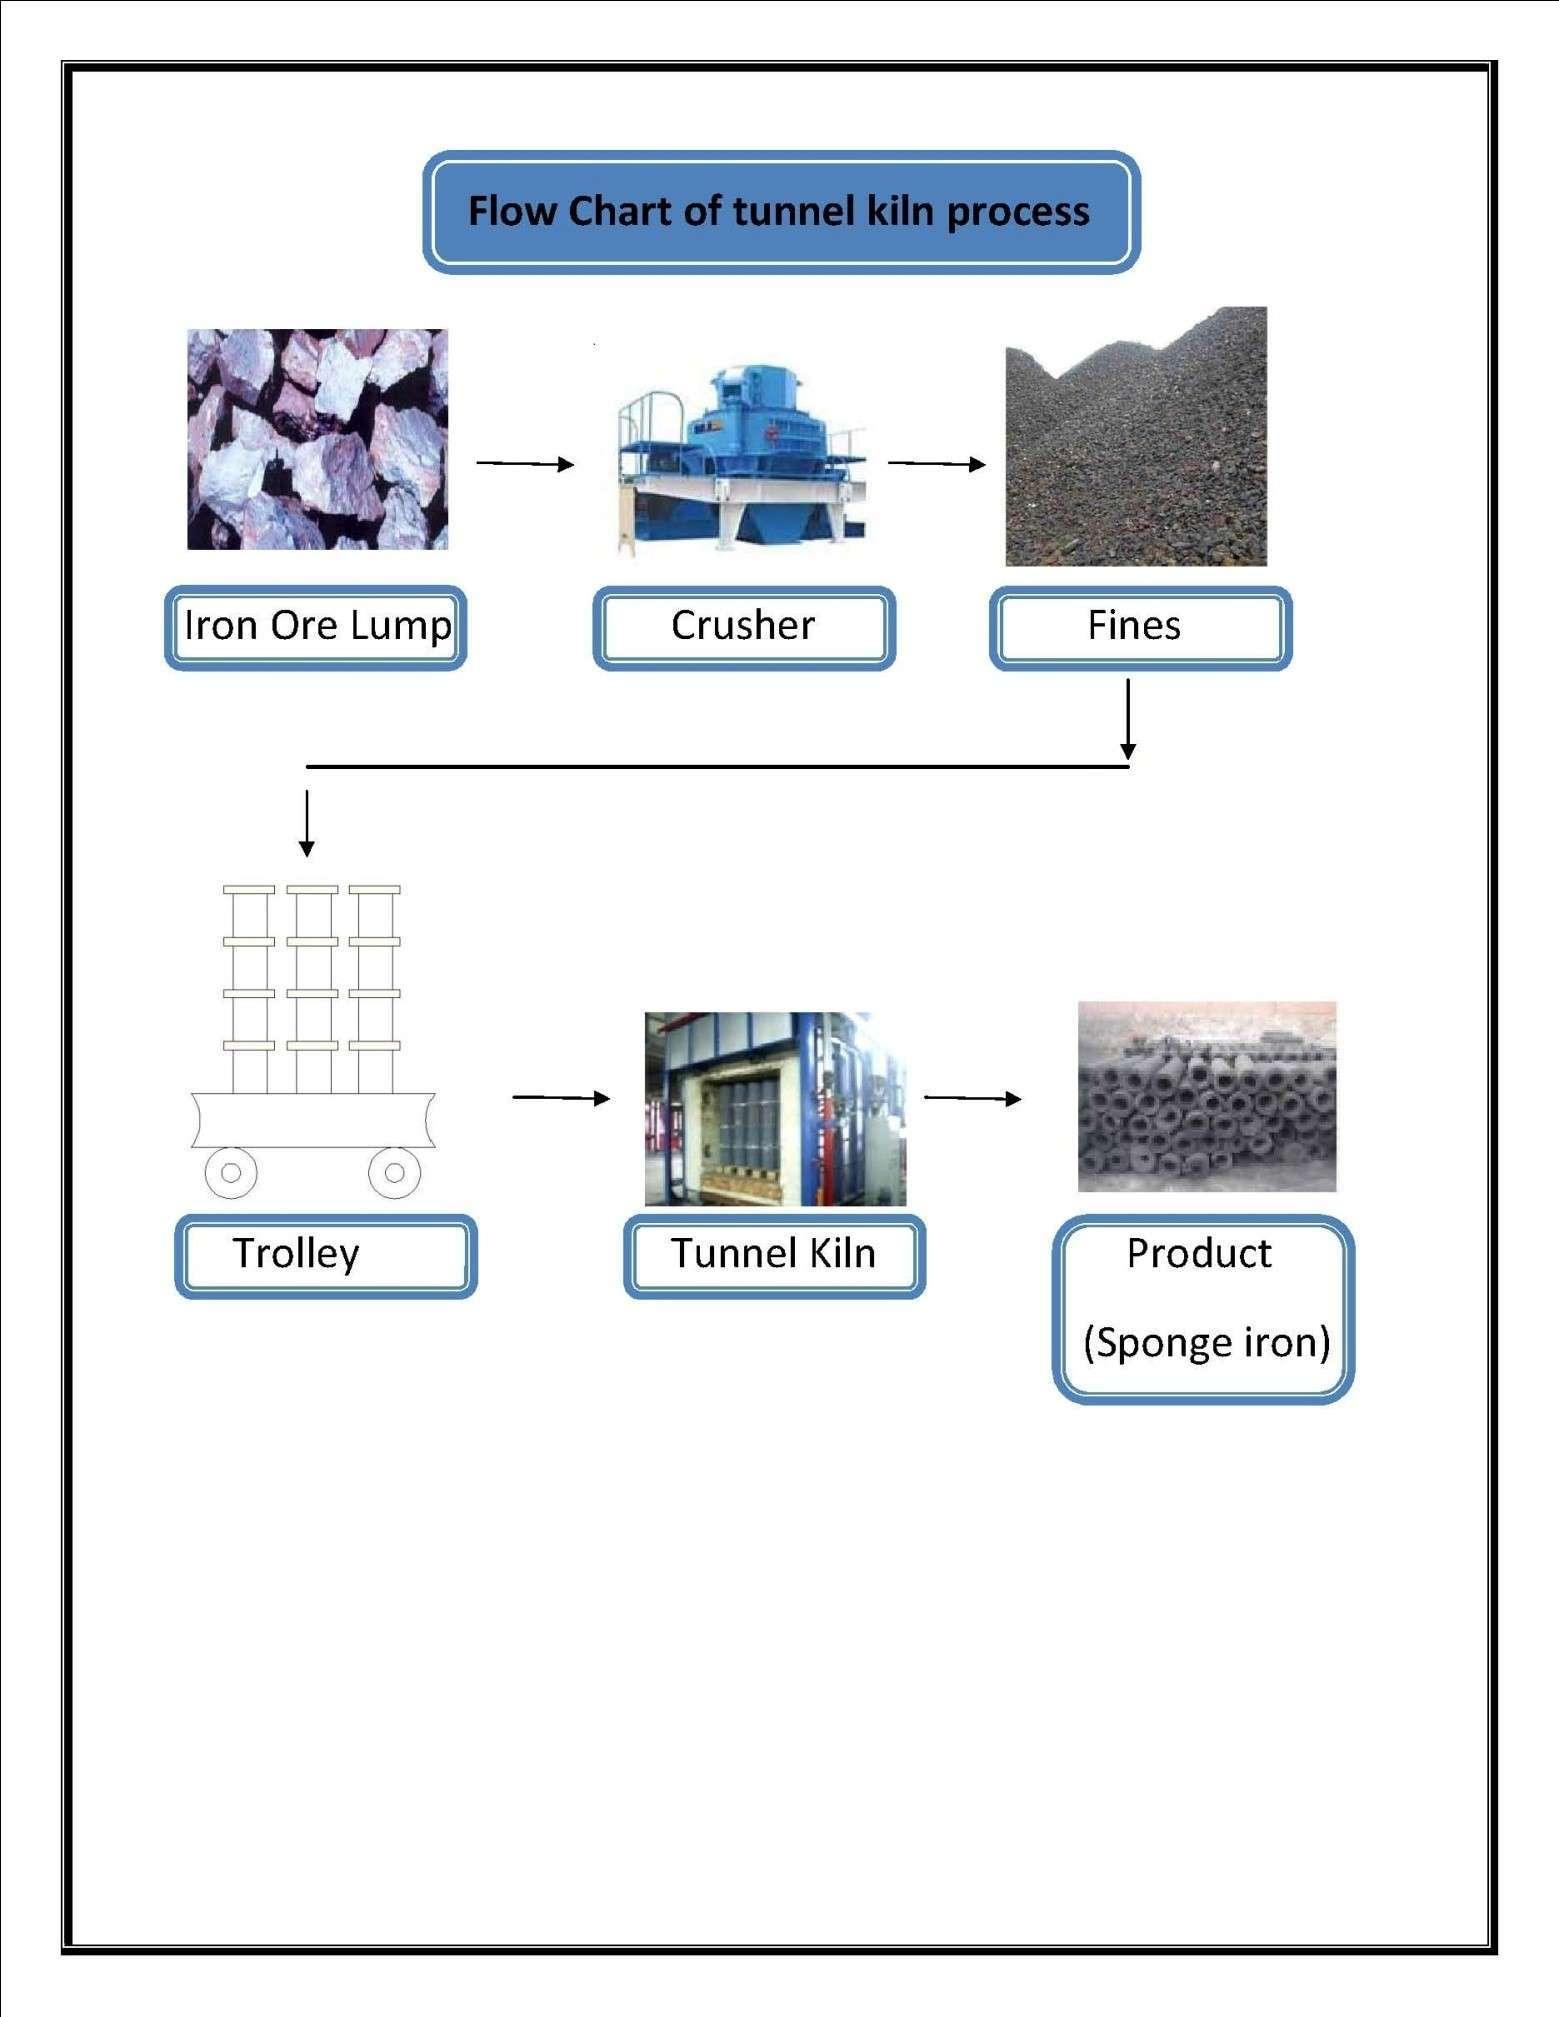 Tunnel Kiln Process Flaw Chart - ElectrothermEnP